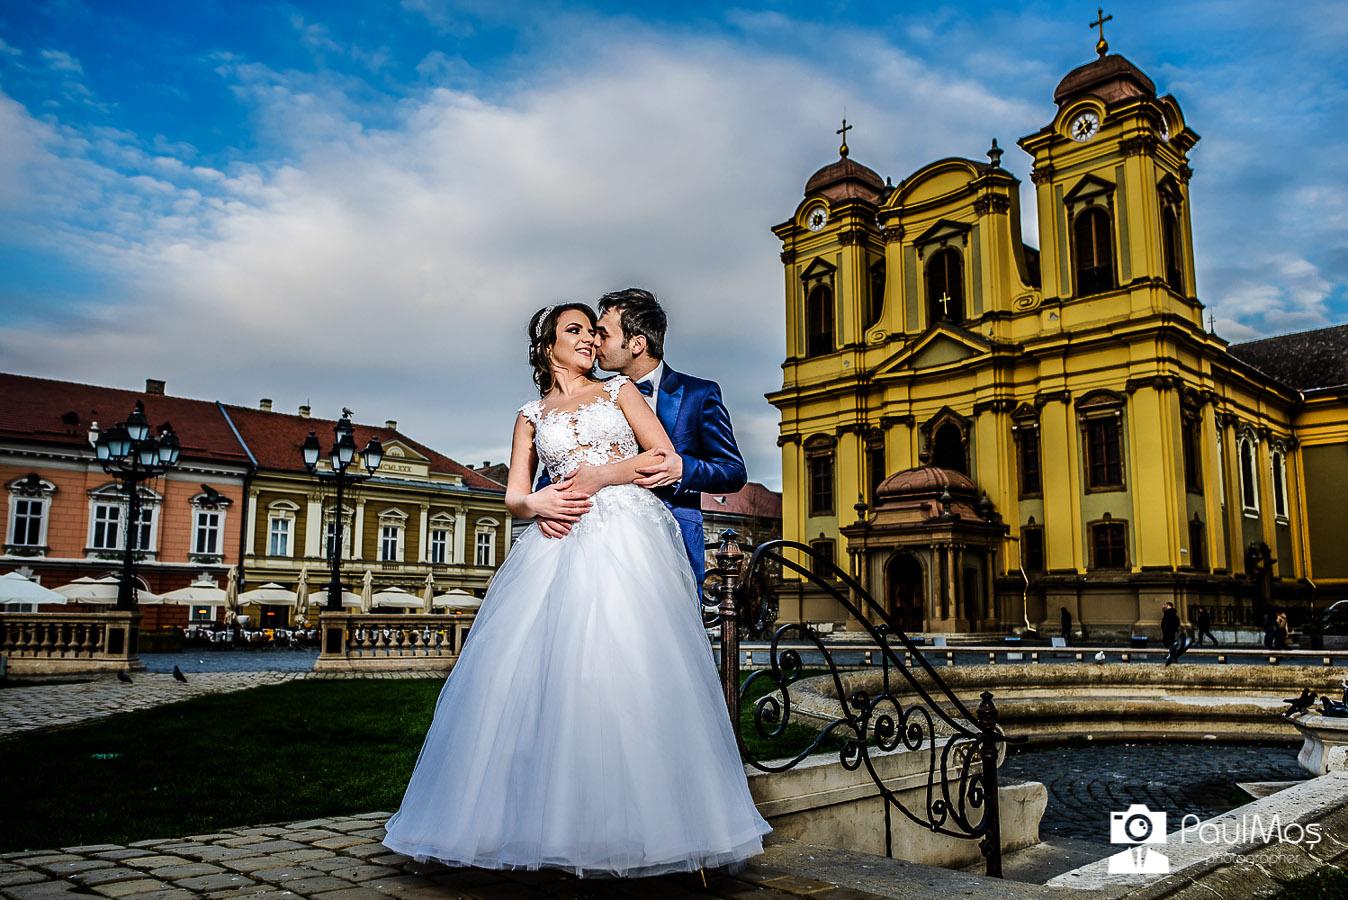 Sedinta Foto nunta, fotograf profesionist